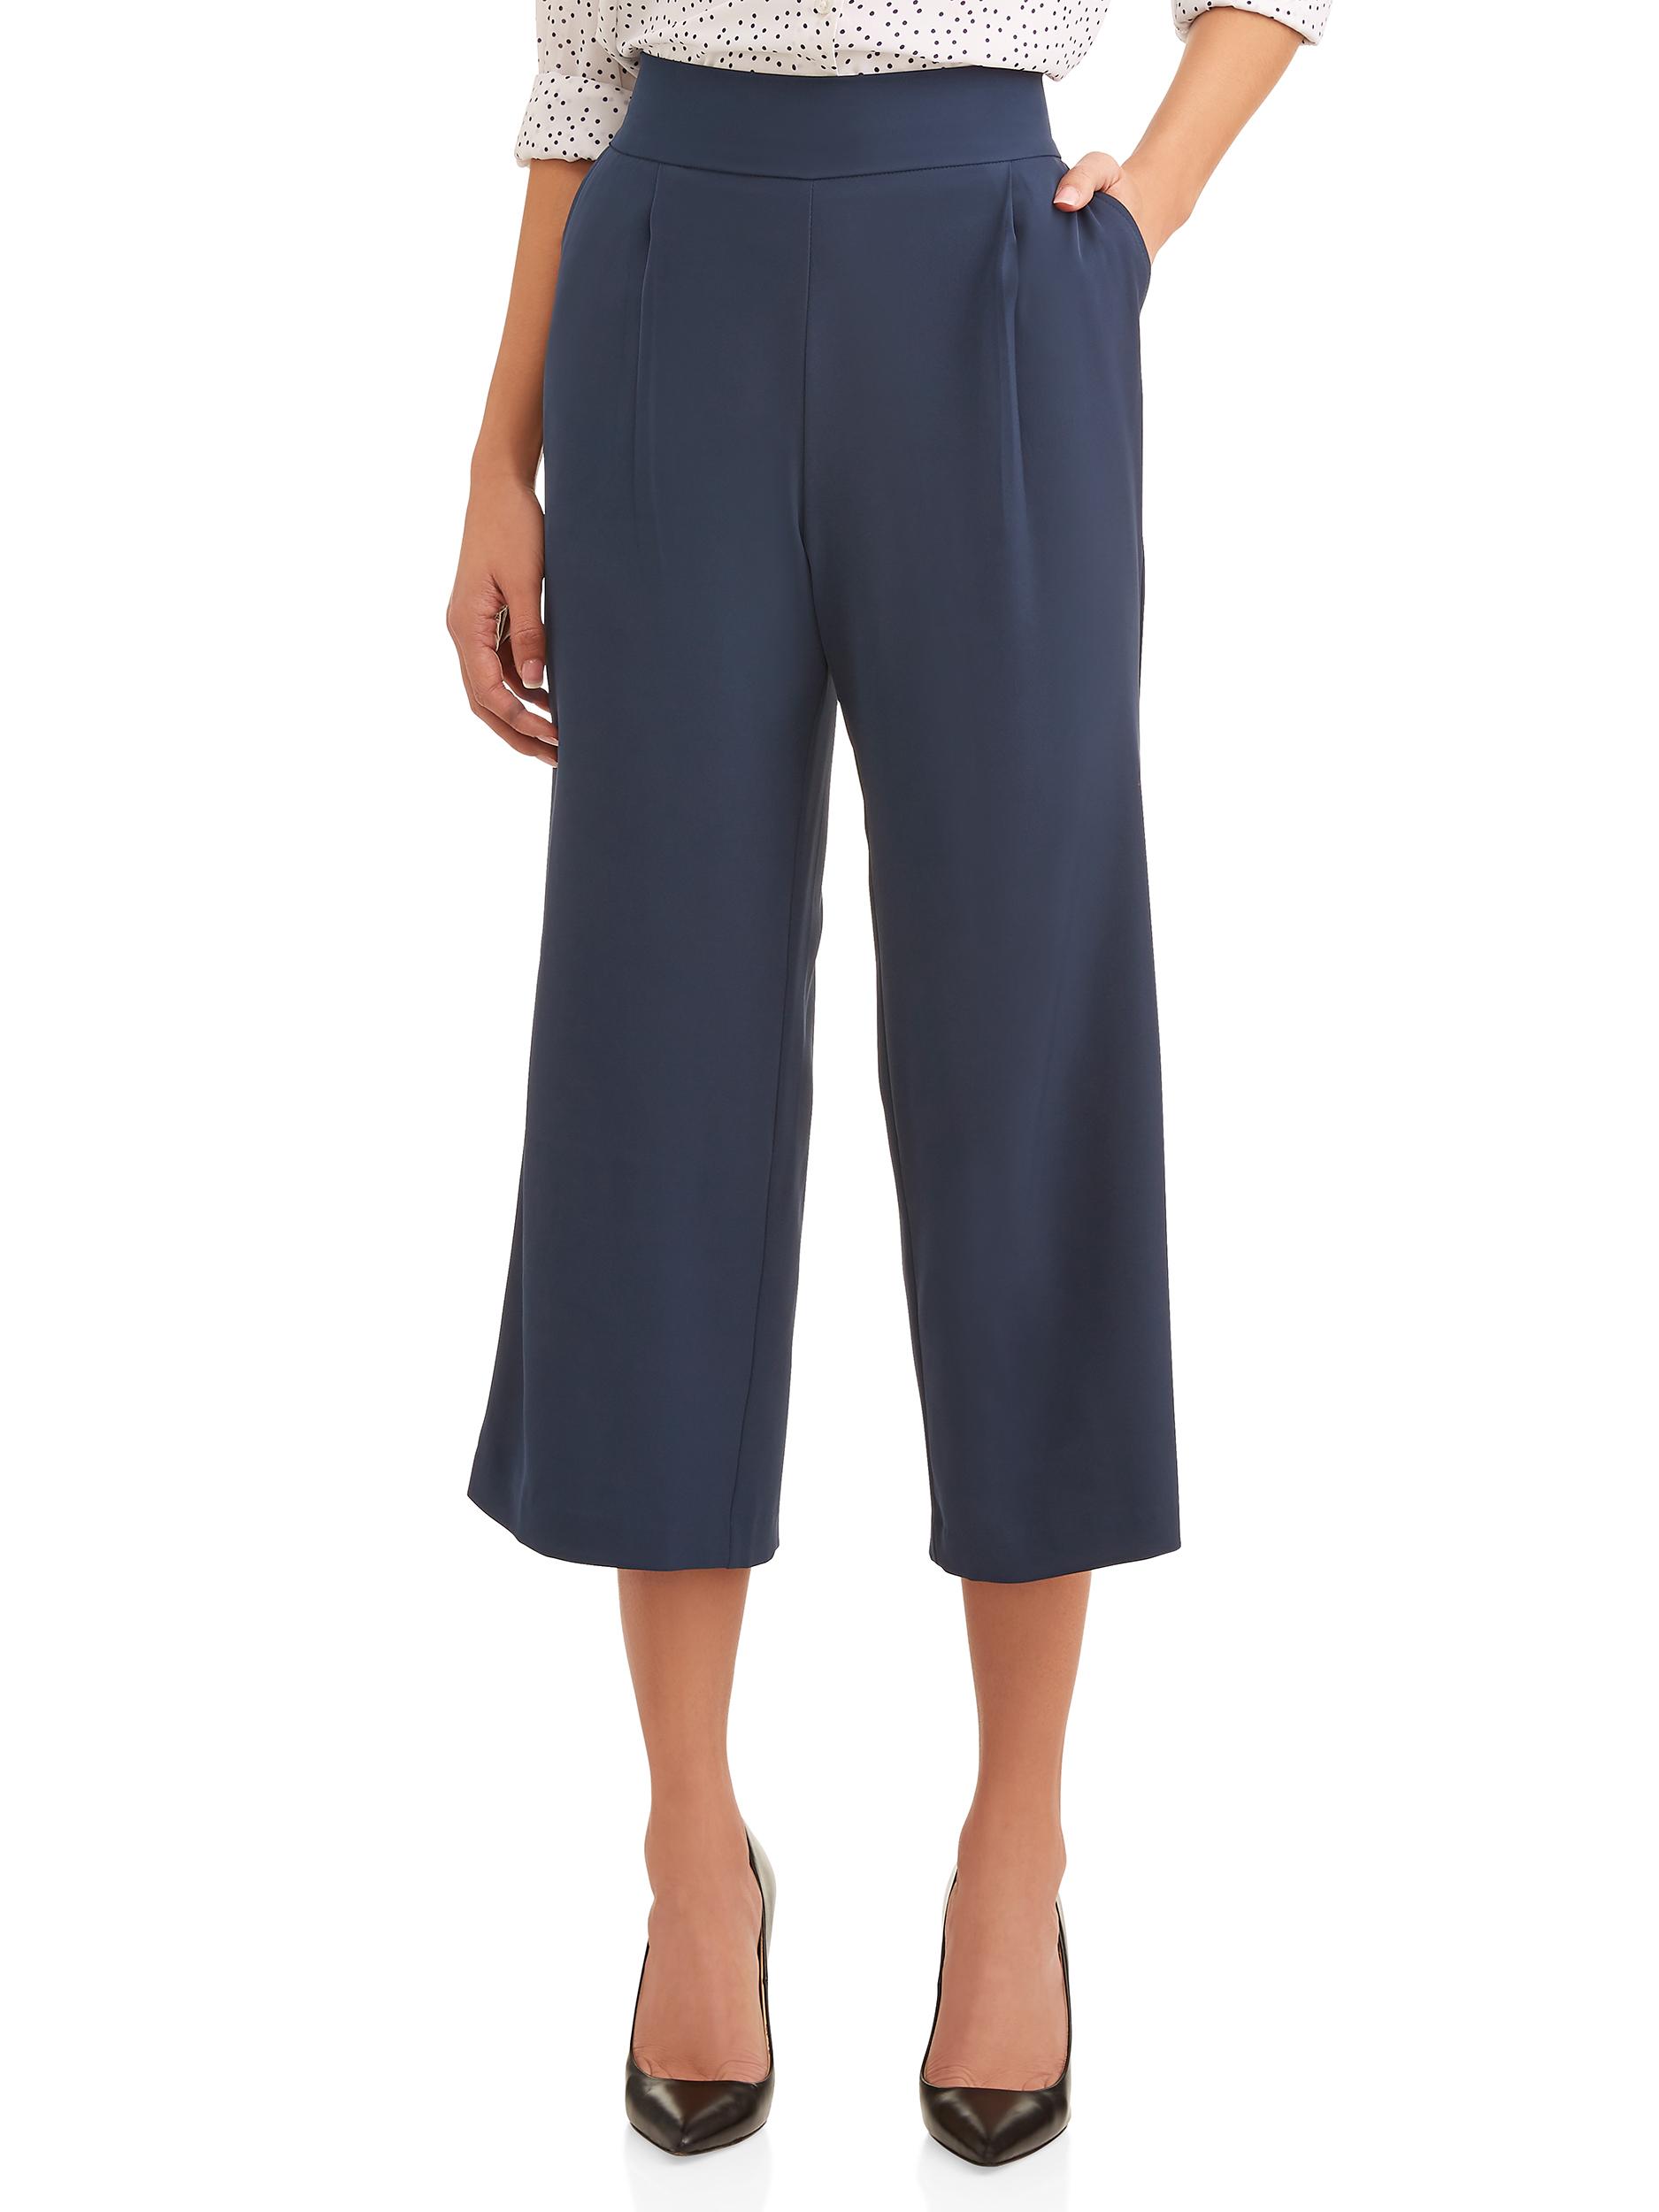 Women's Wide Leg Soft Pant